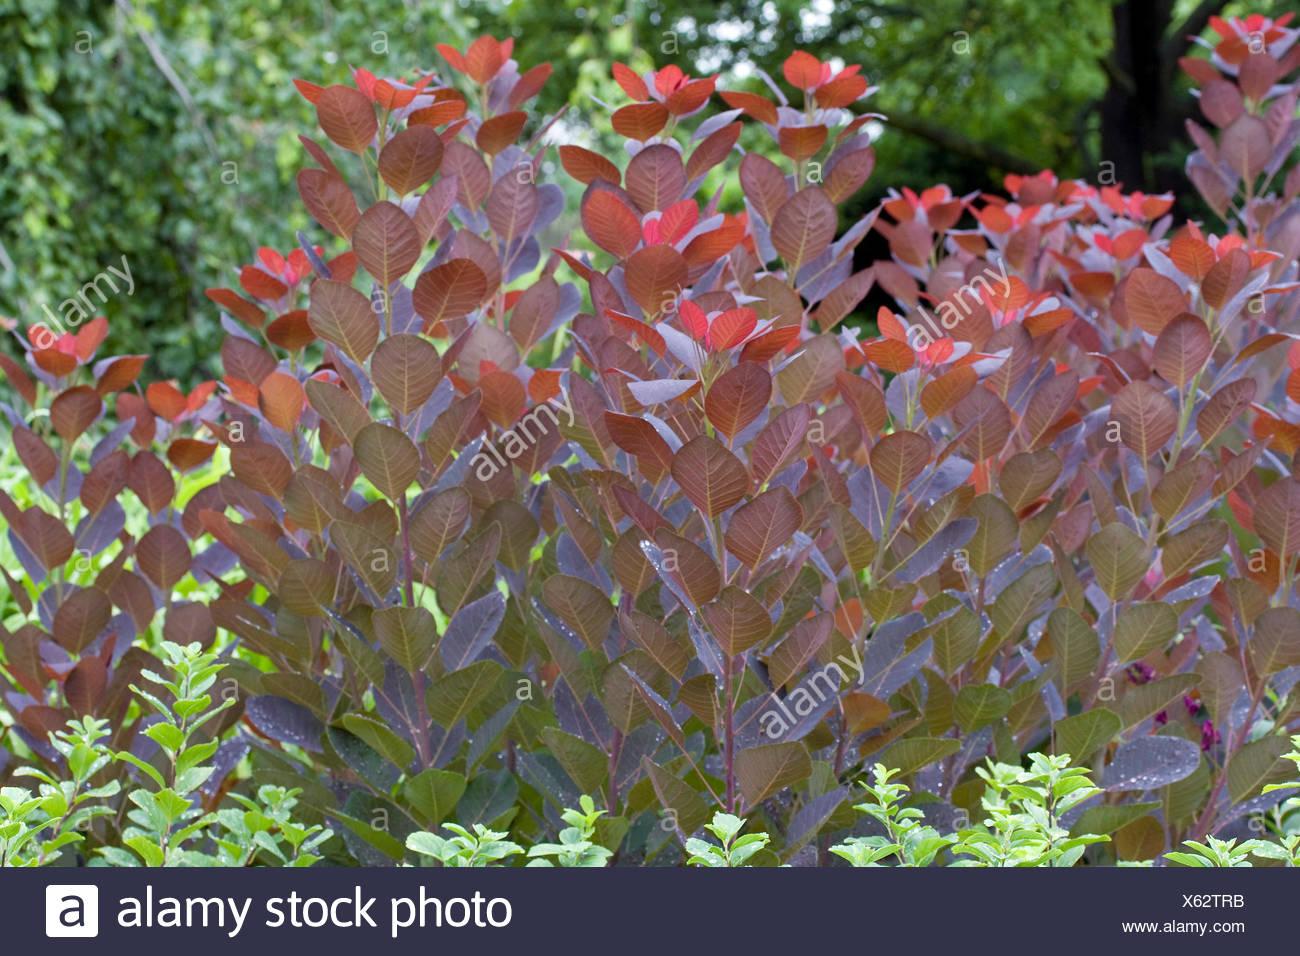 Cashew Bush Or Tree